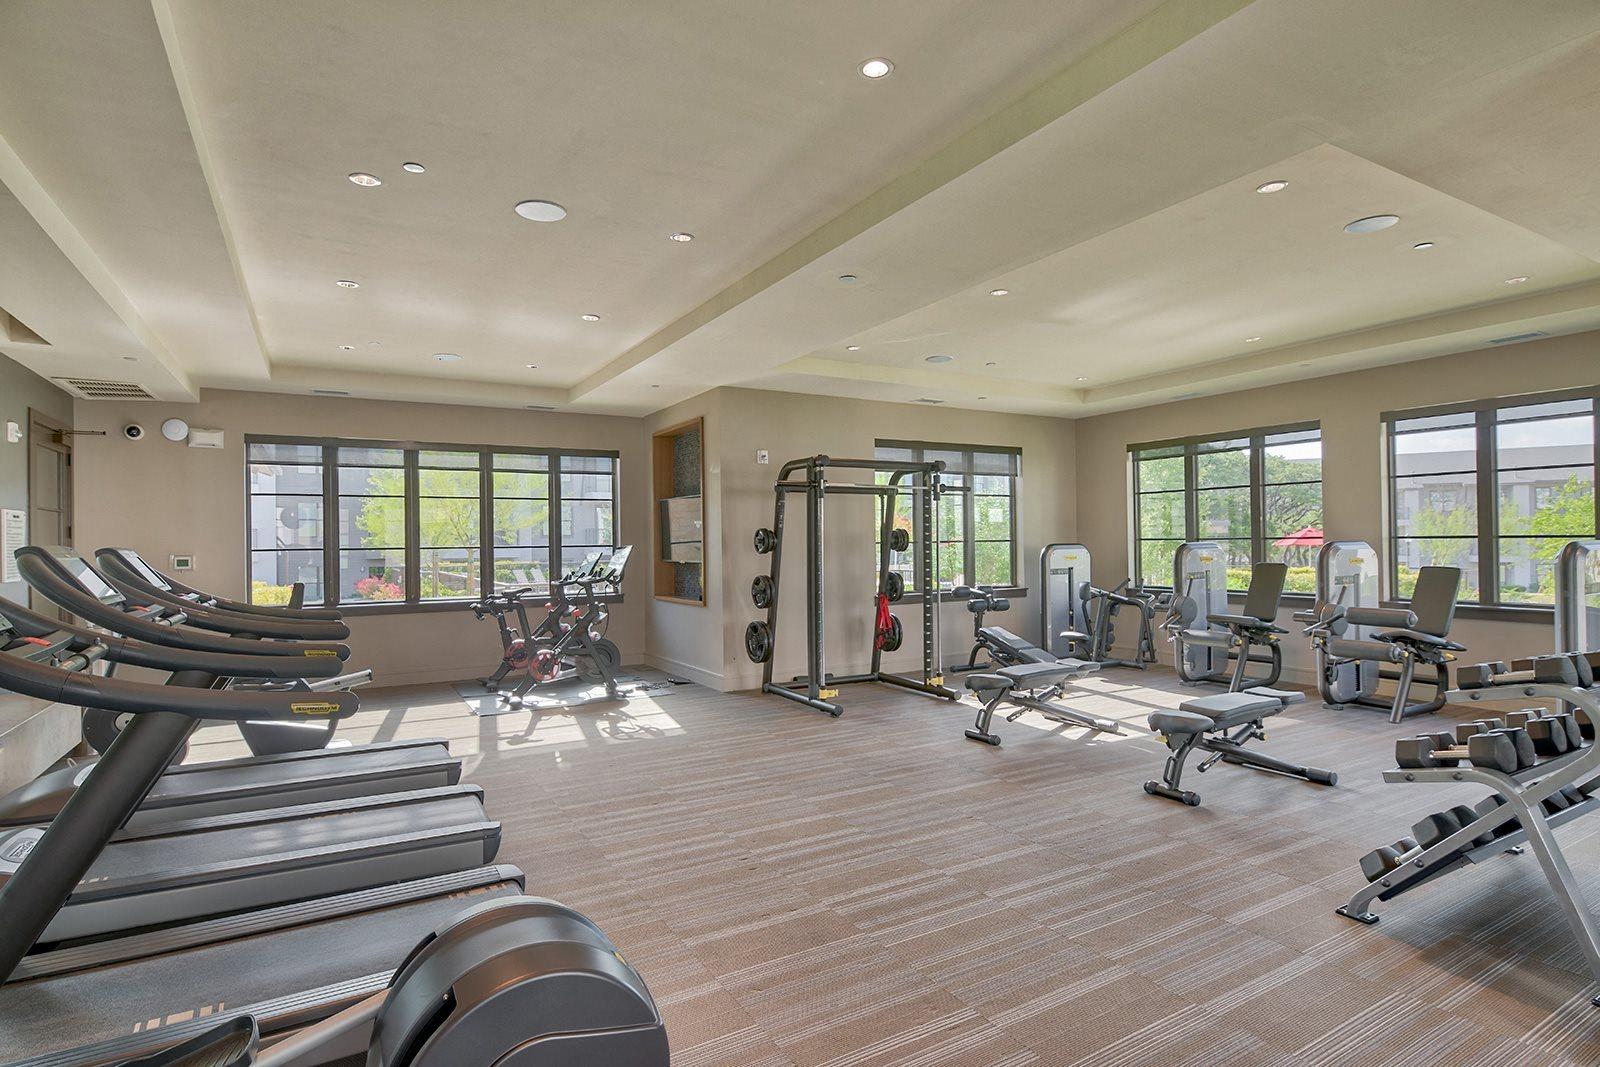 24 hour Technogym Fitness Center at Windsor Lantana Hills, 6601 Rialto Blvd, TX